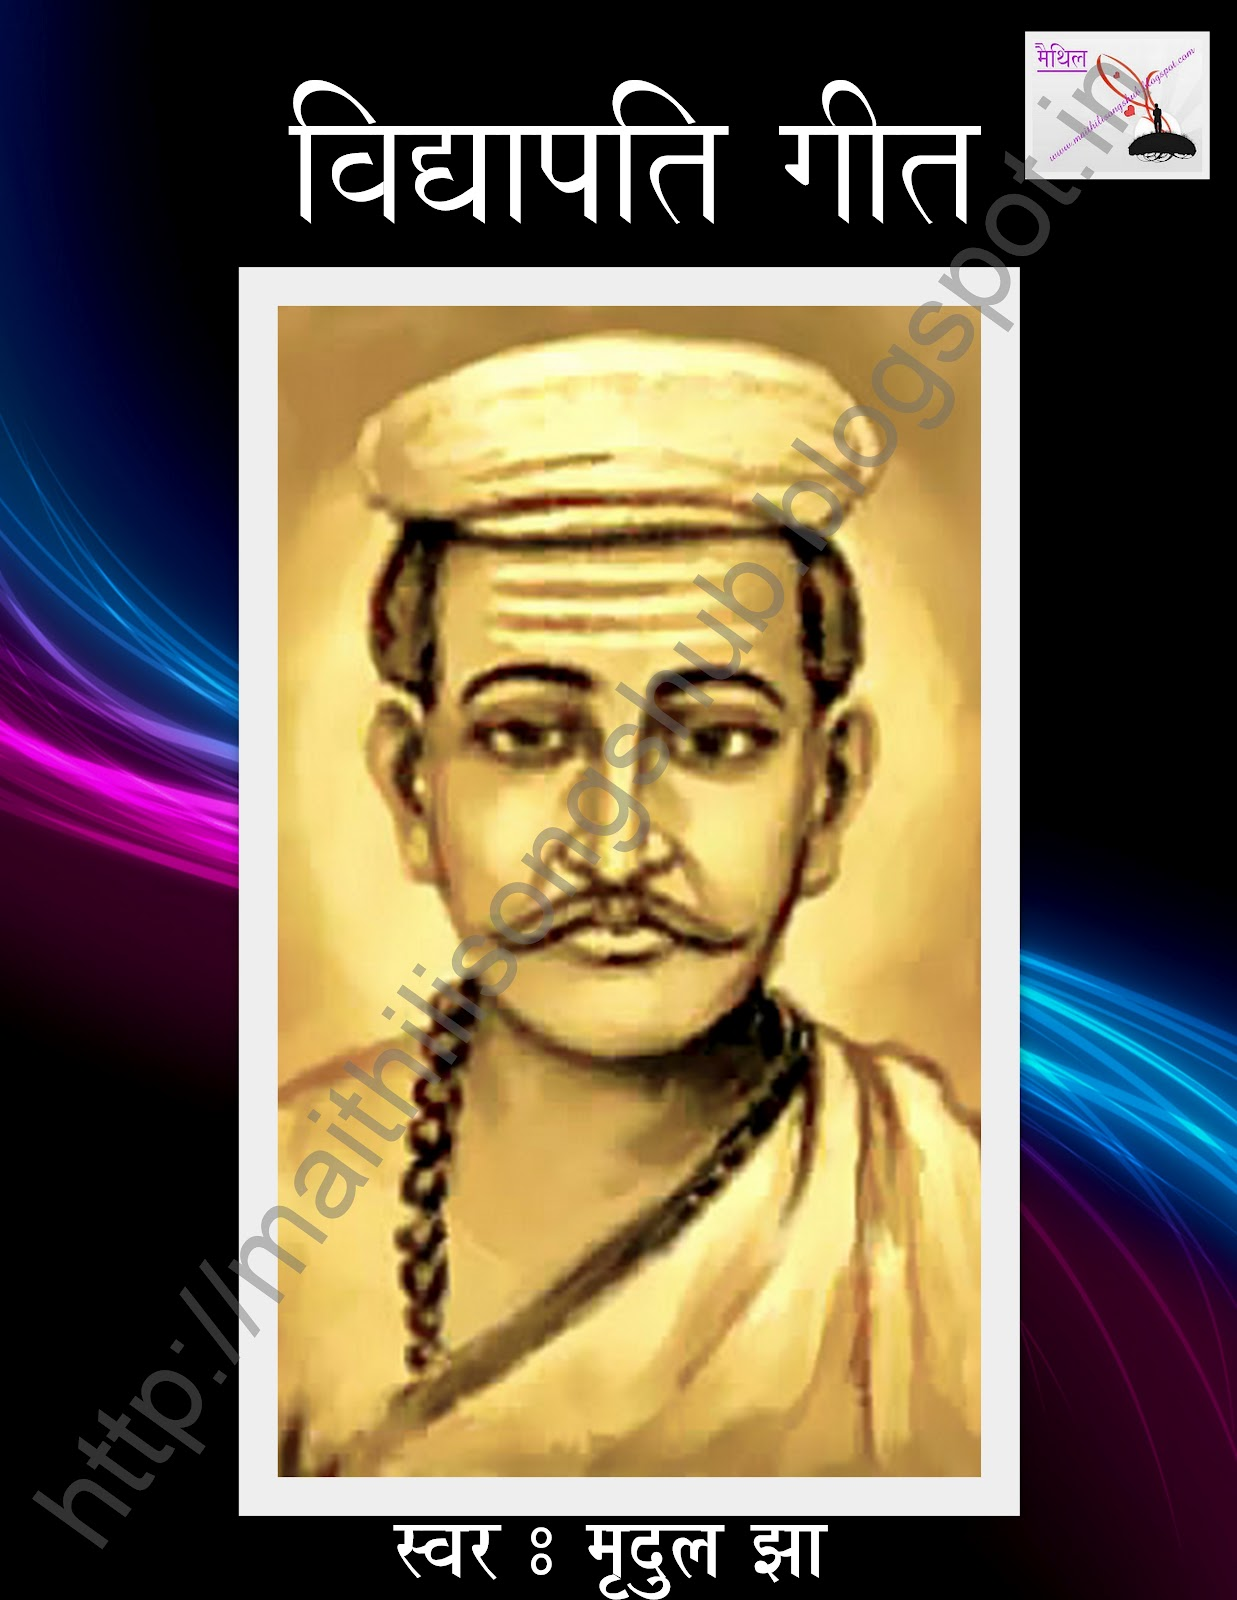 Maithili songs vidyapati free download.